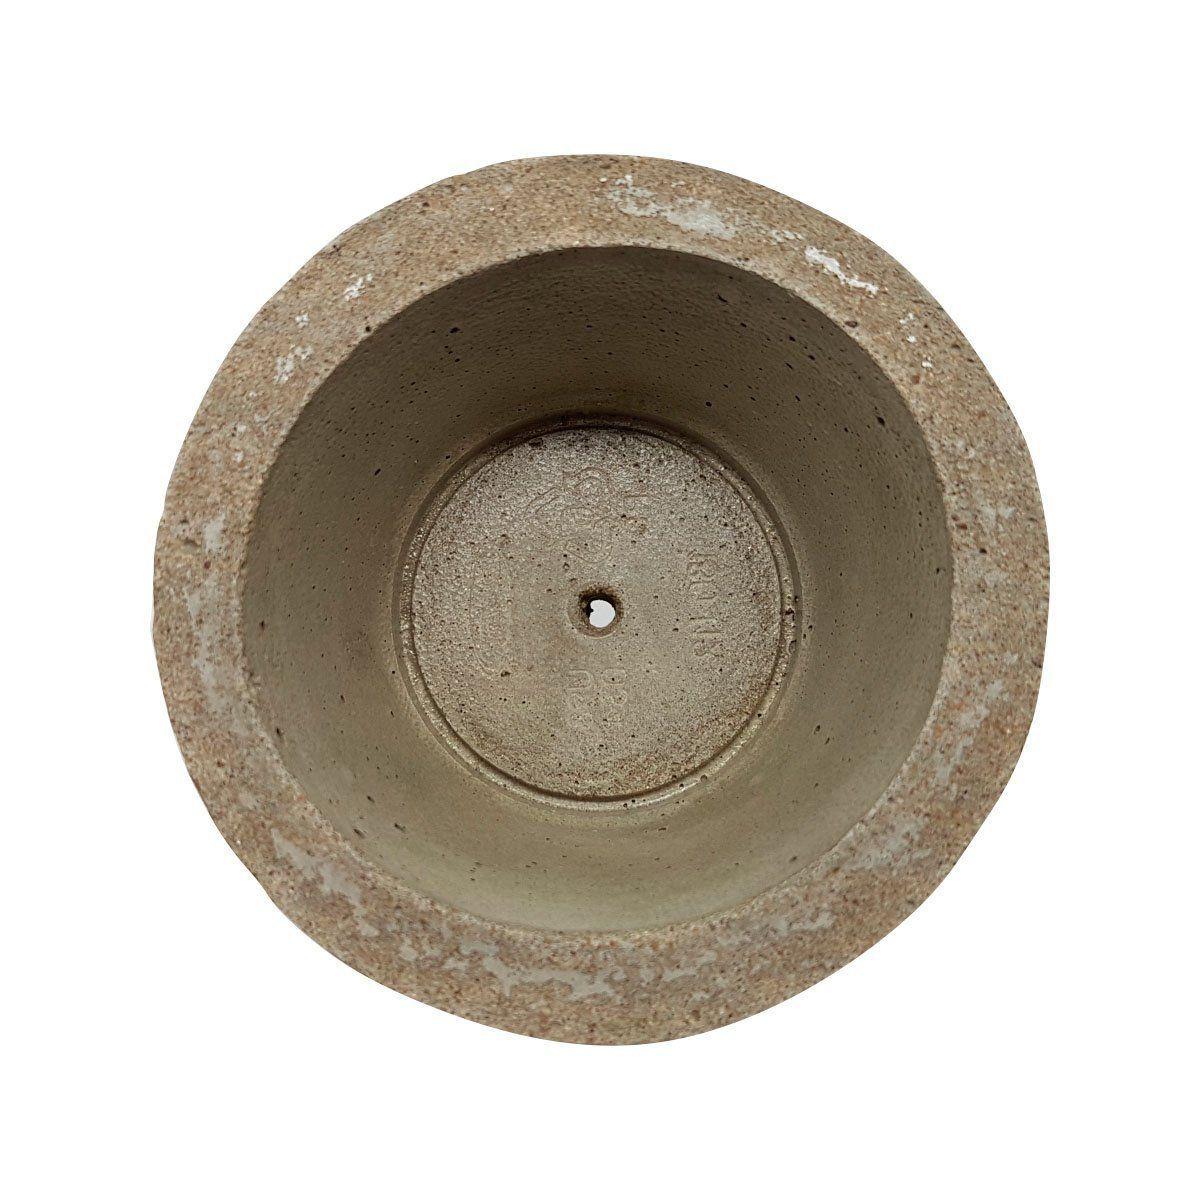 Vaso de cimento 6cm x 10cm MD02